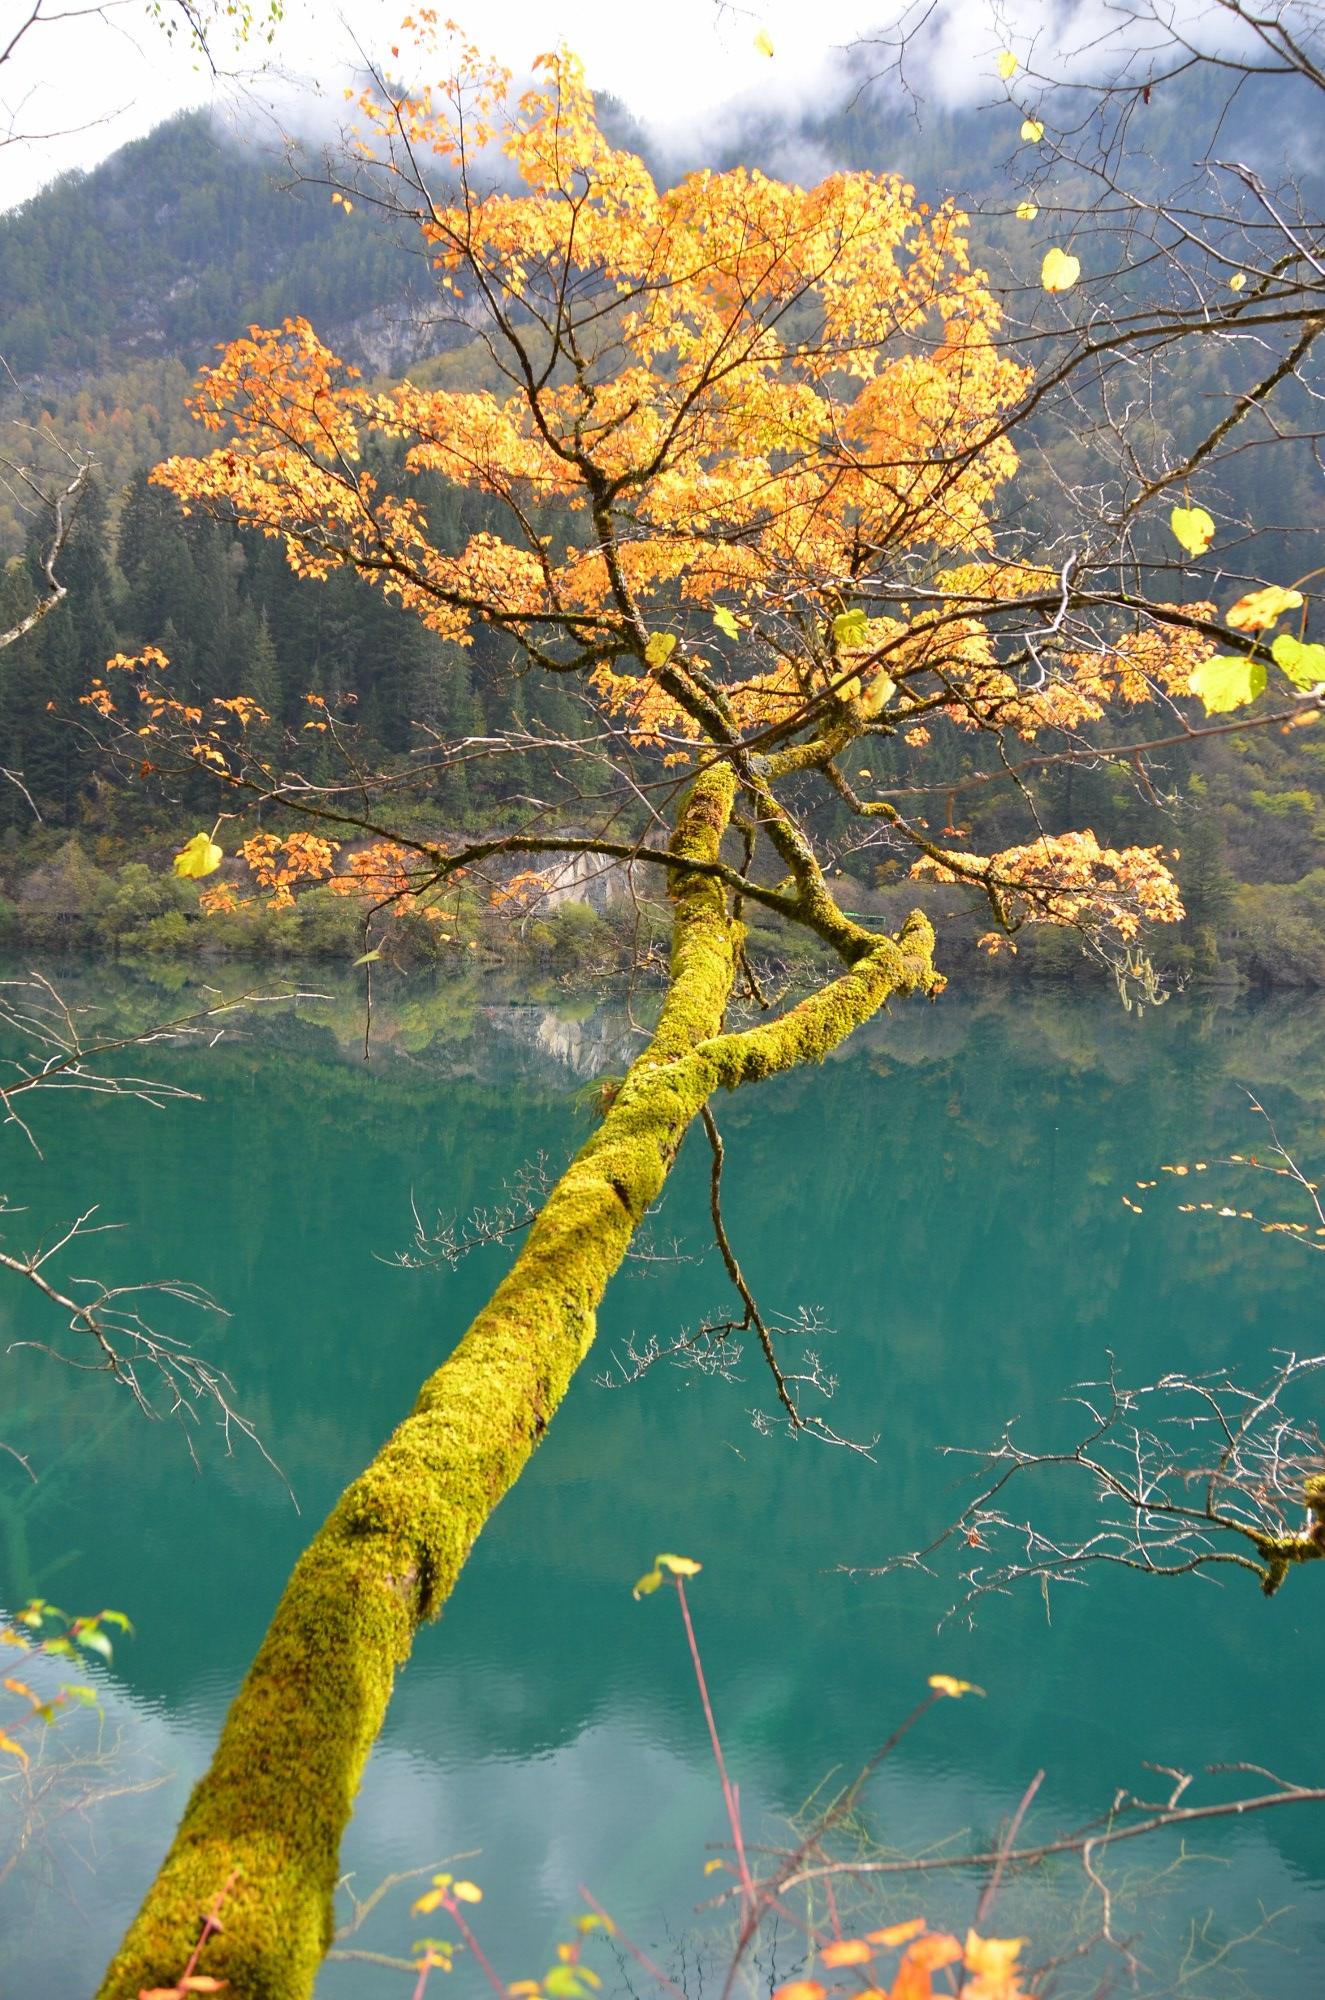 jiuzhaigou tronco amarelo lago azul verde